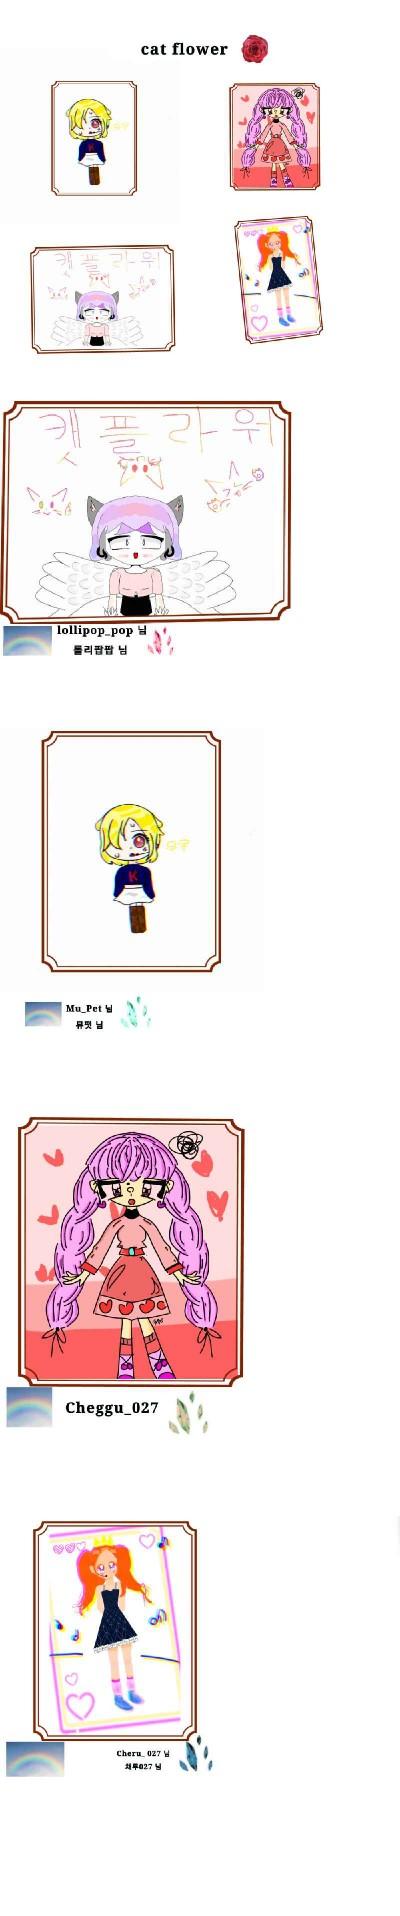 Cat flower 팀 1차 합작    Cheru_027   Digital Drawing   PENUP